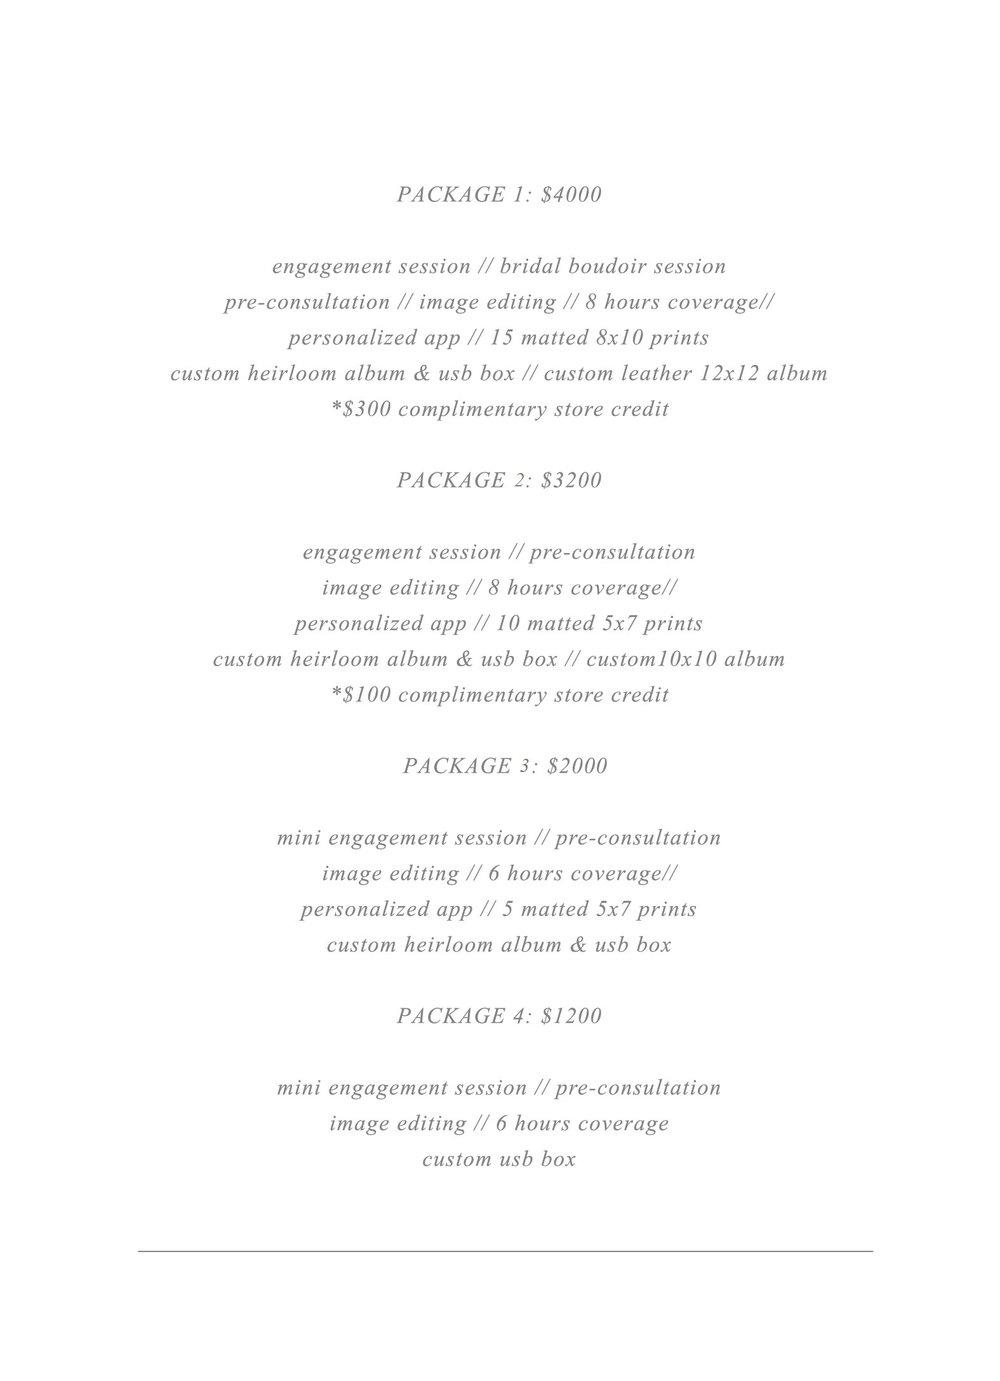 wedding pricing guide 2.jpg